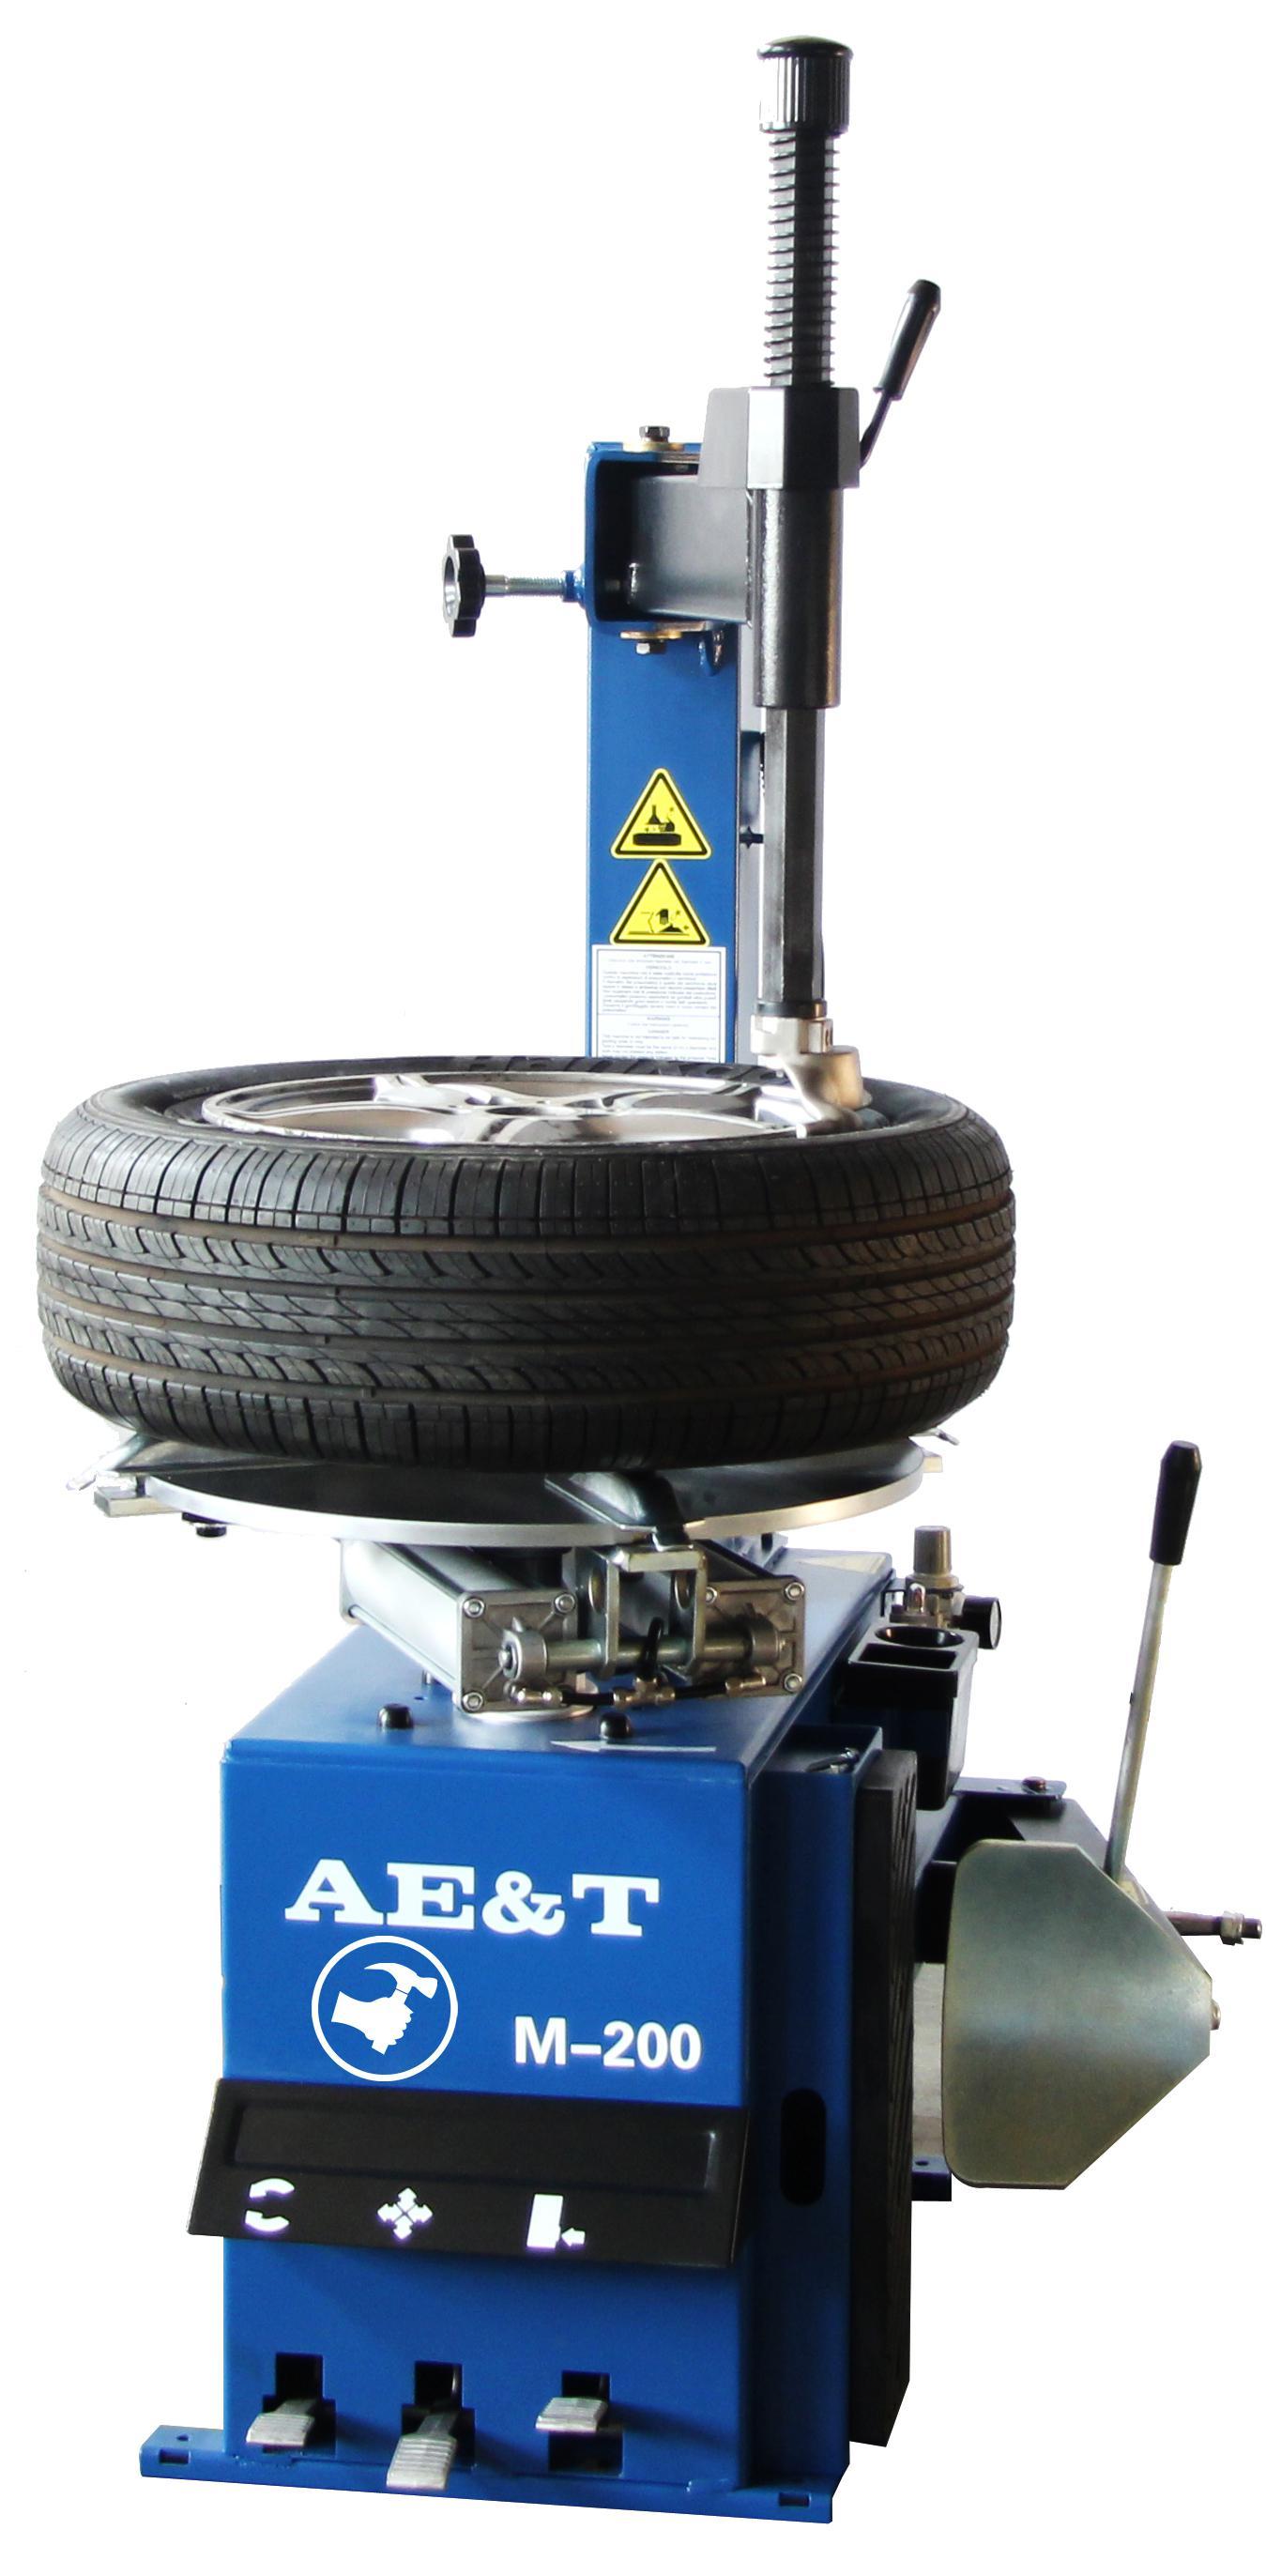 цена на Станок шиномонтажный Ae&t M-200 380b